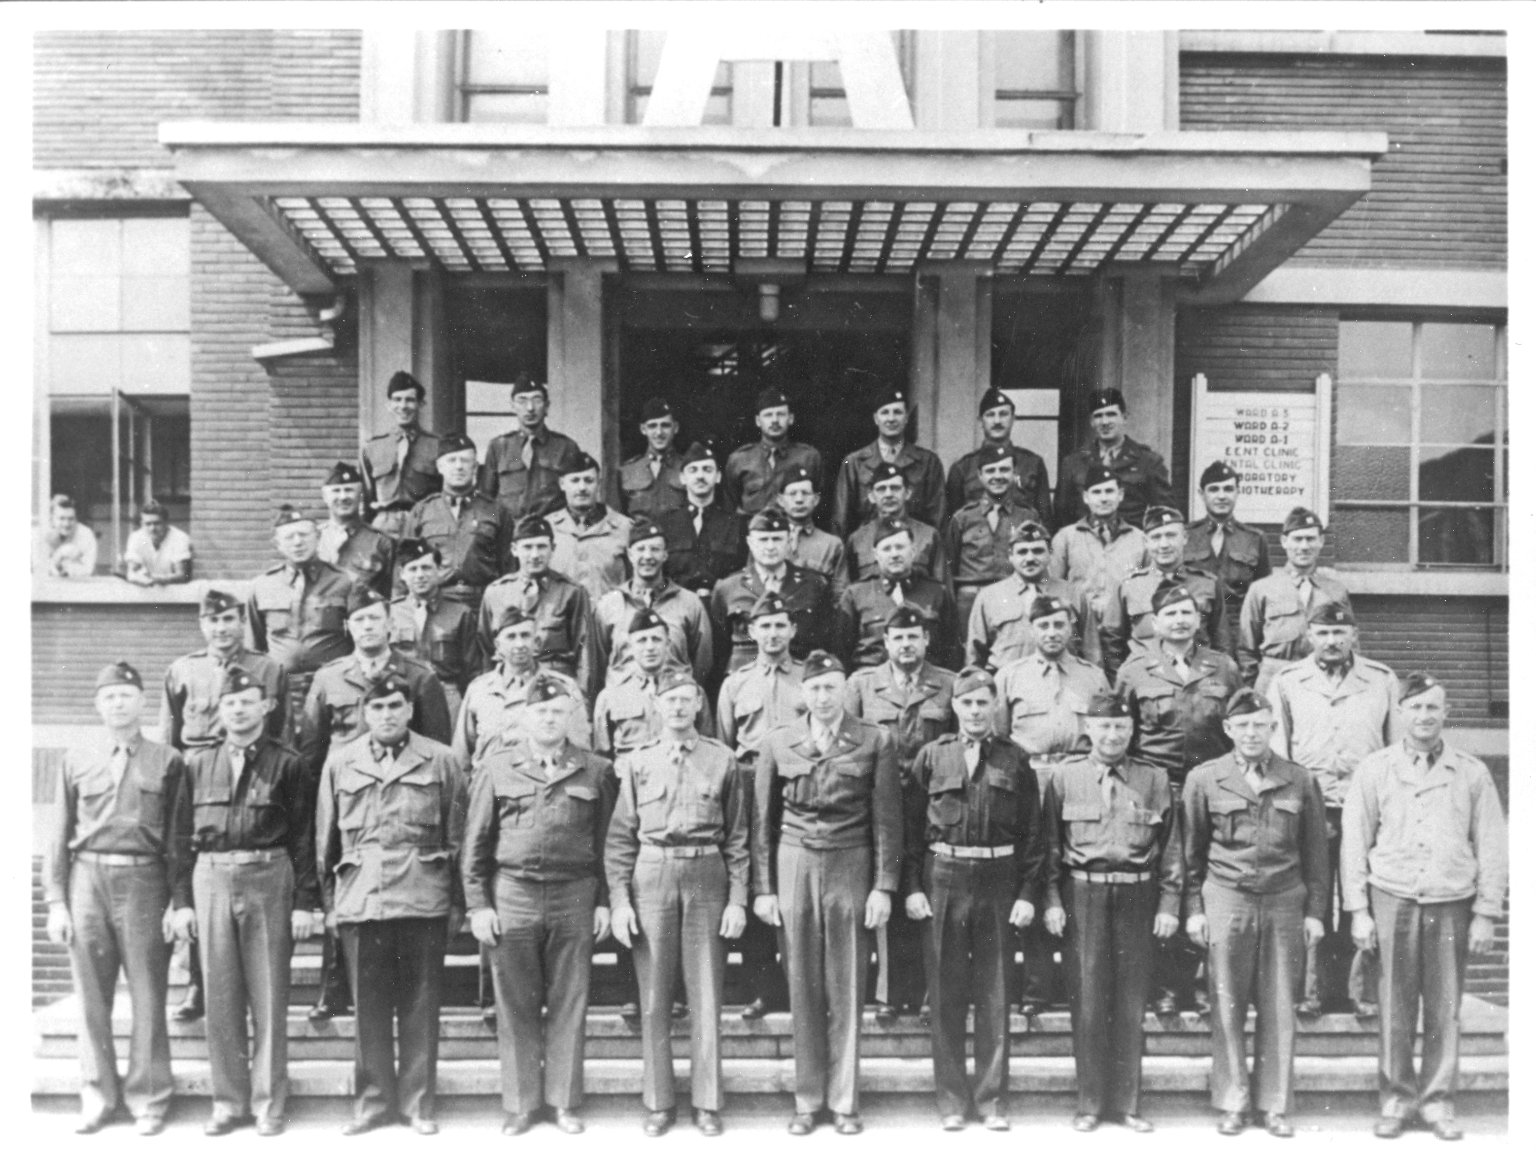 Tongres, Belgium. Officers, Group Photo